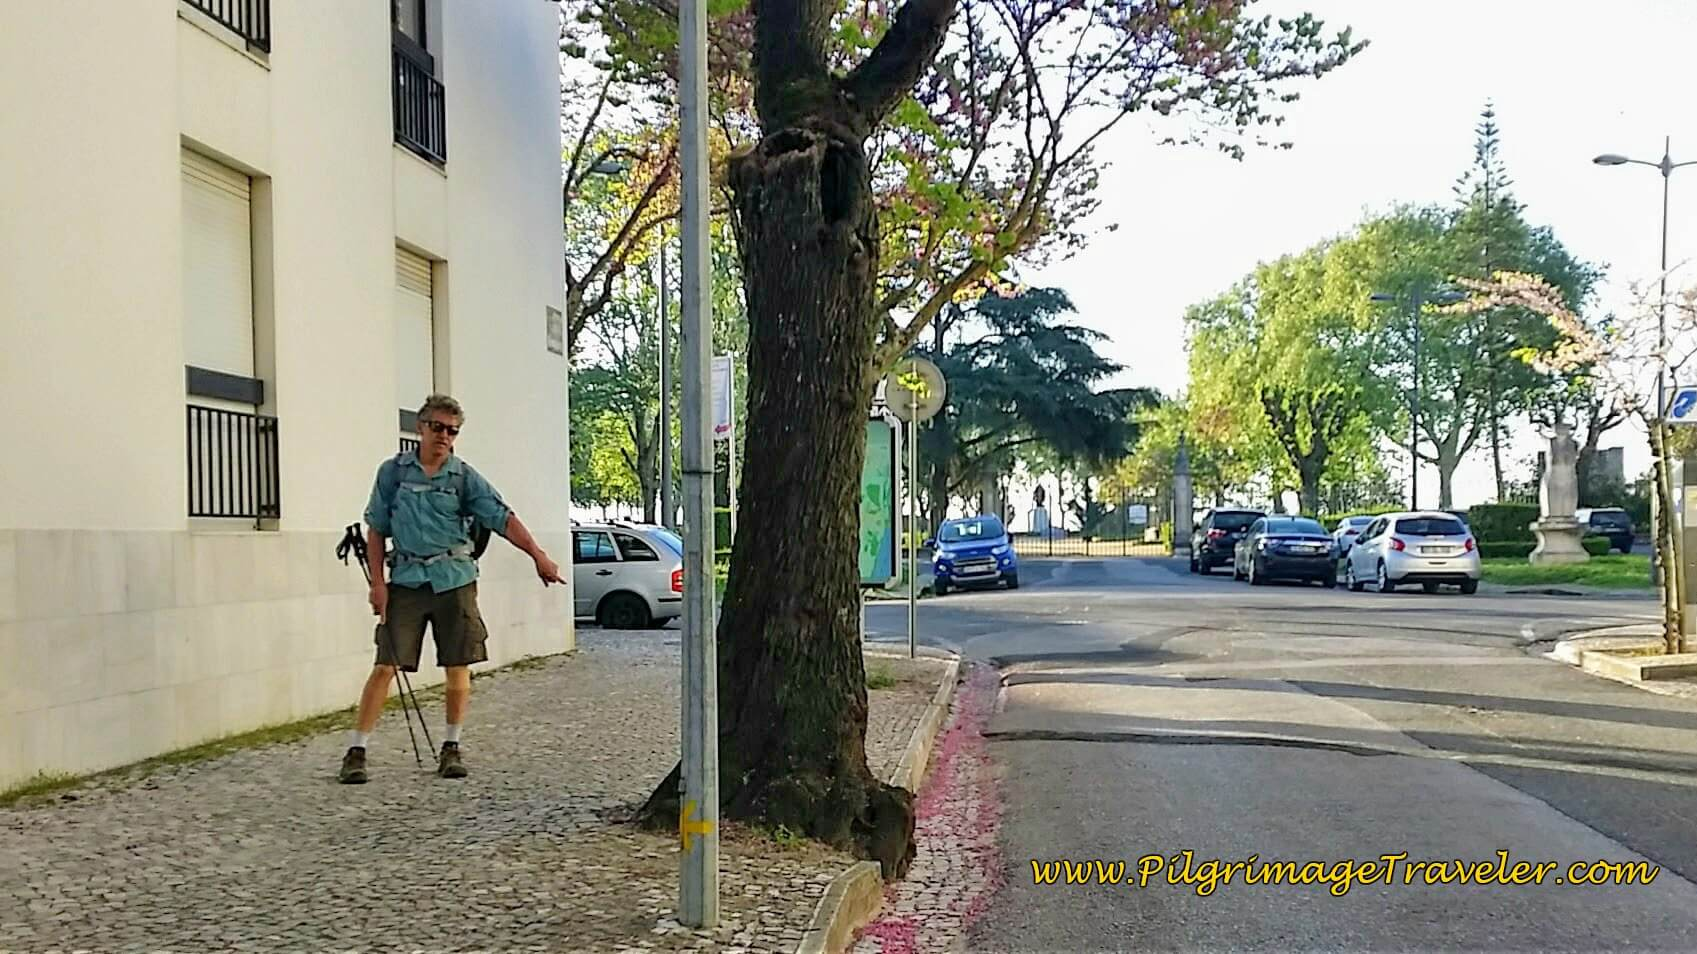 Small Yellow Arrow on Pole, Just Before Portas do Sol, Santarém, Portugal